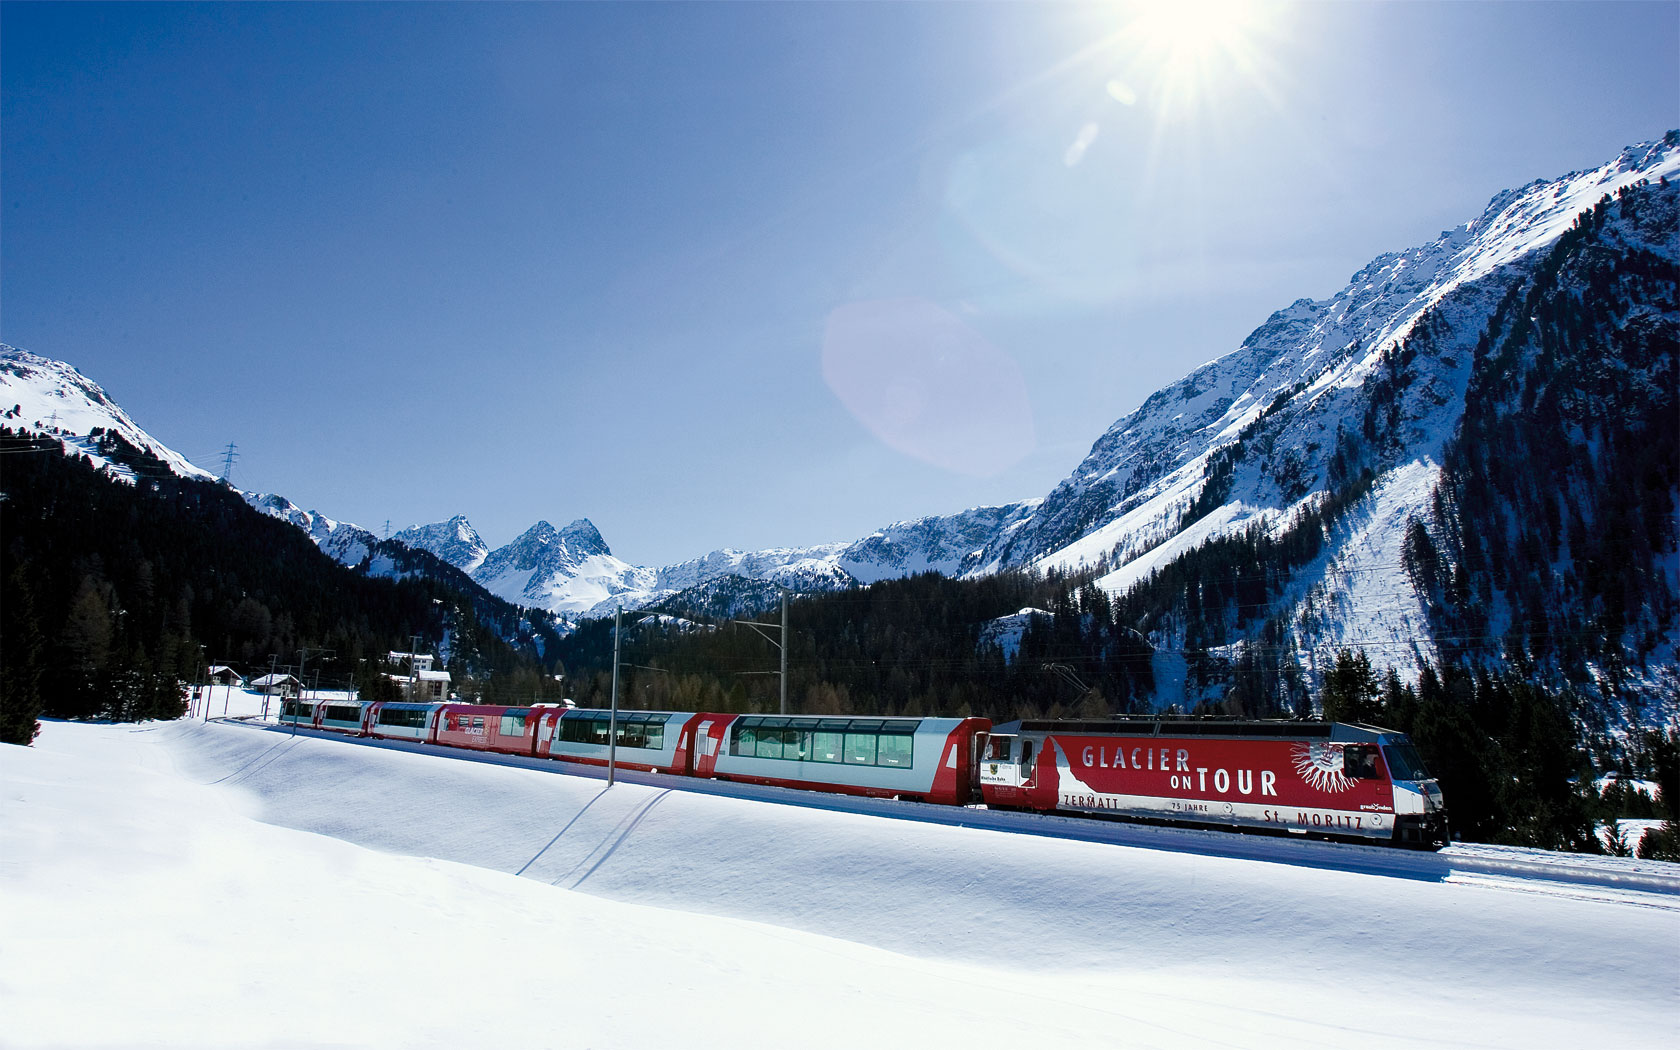 The Glacier Express: Exploring Winter Wonderlands by Rail